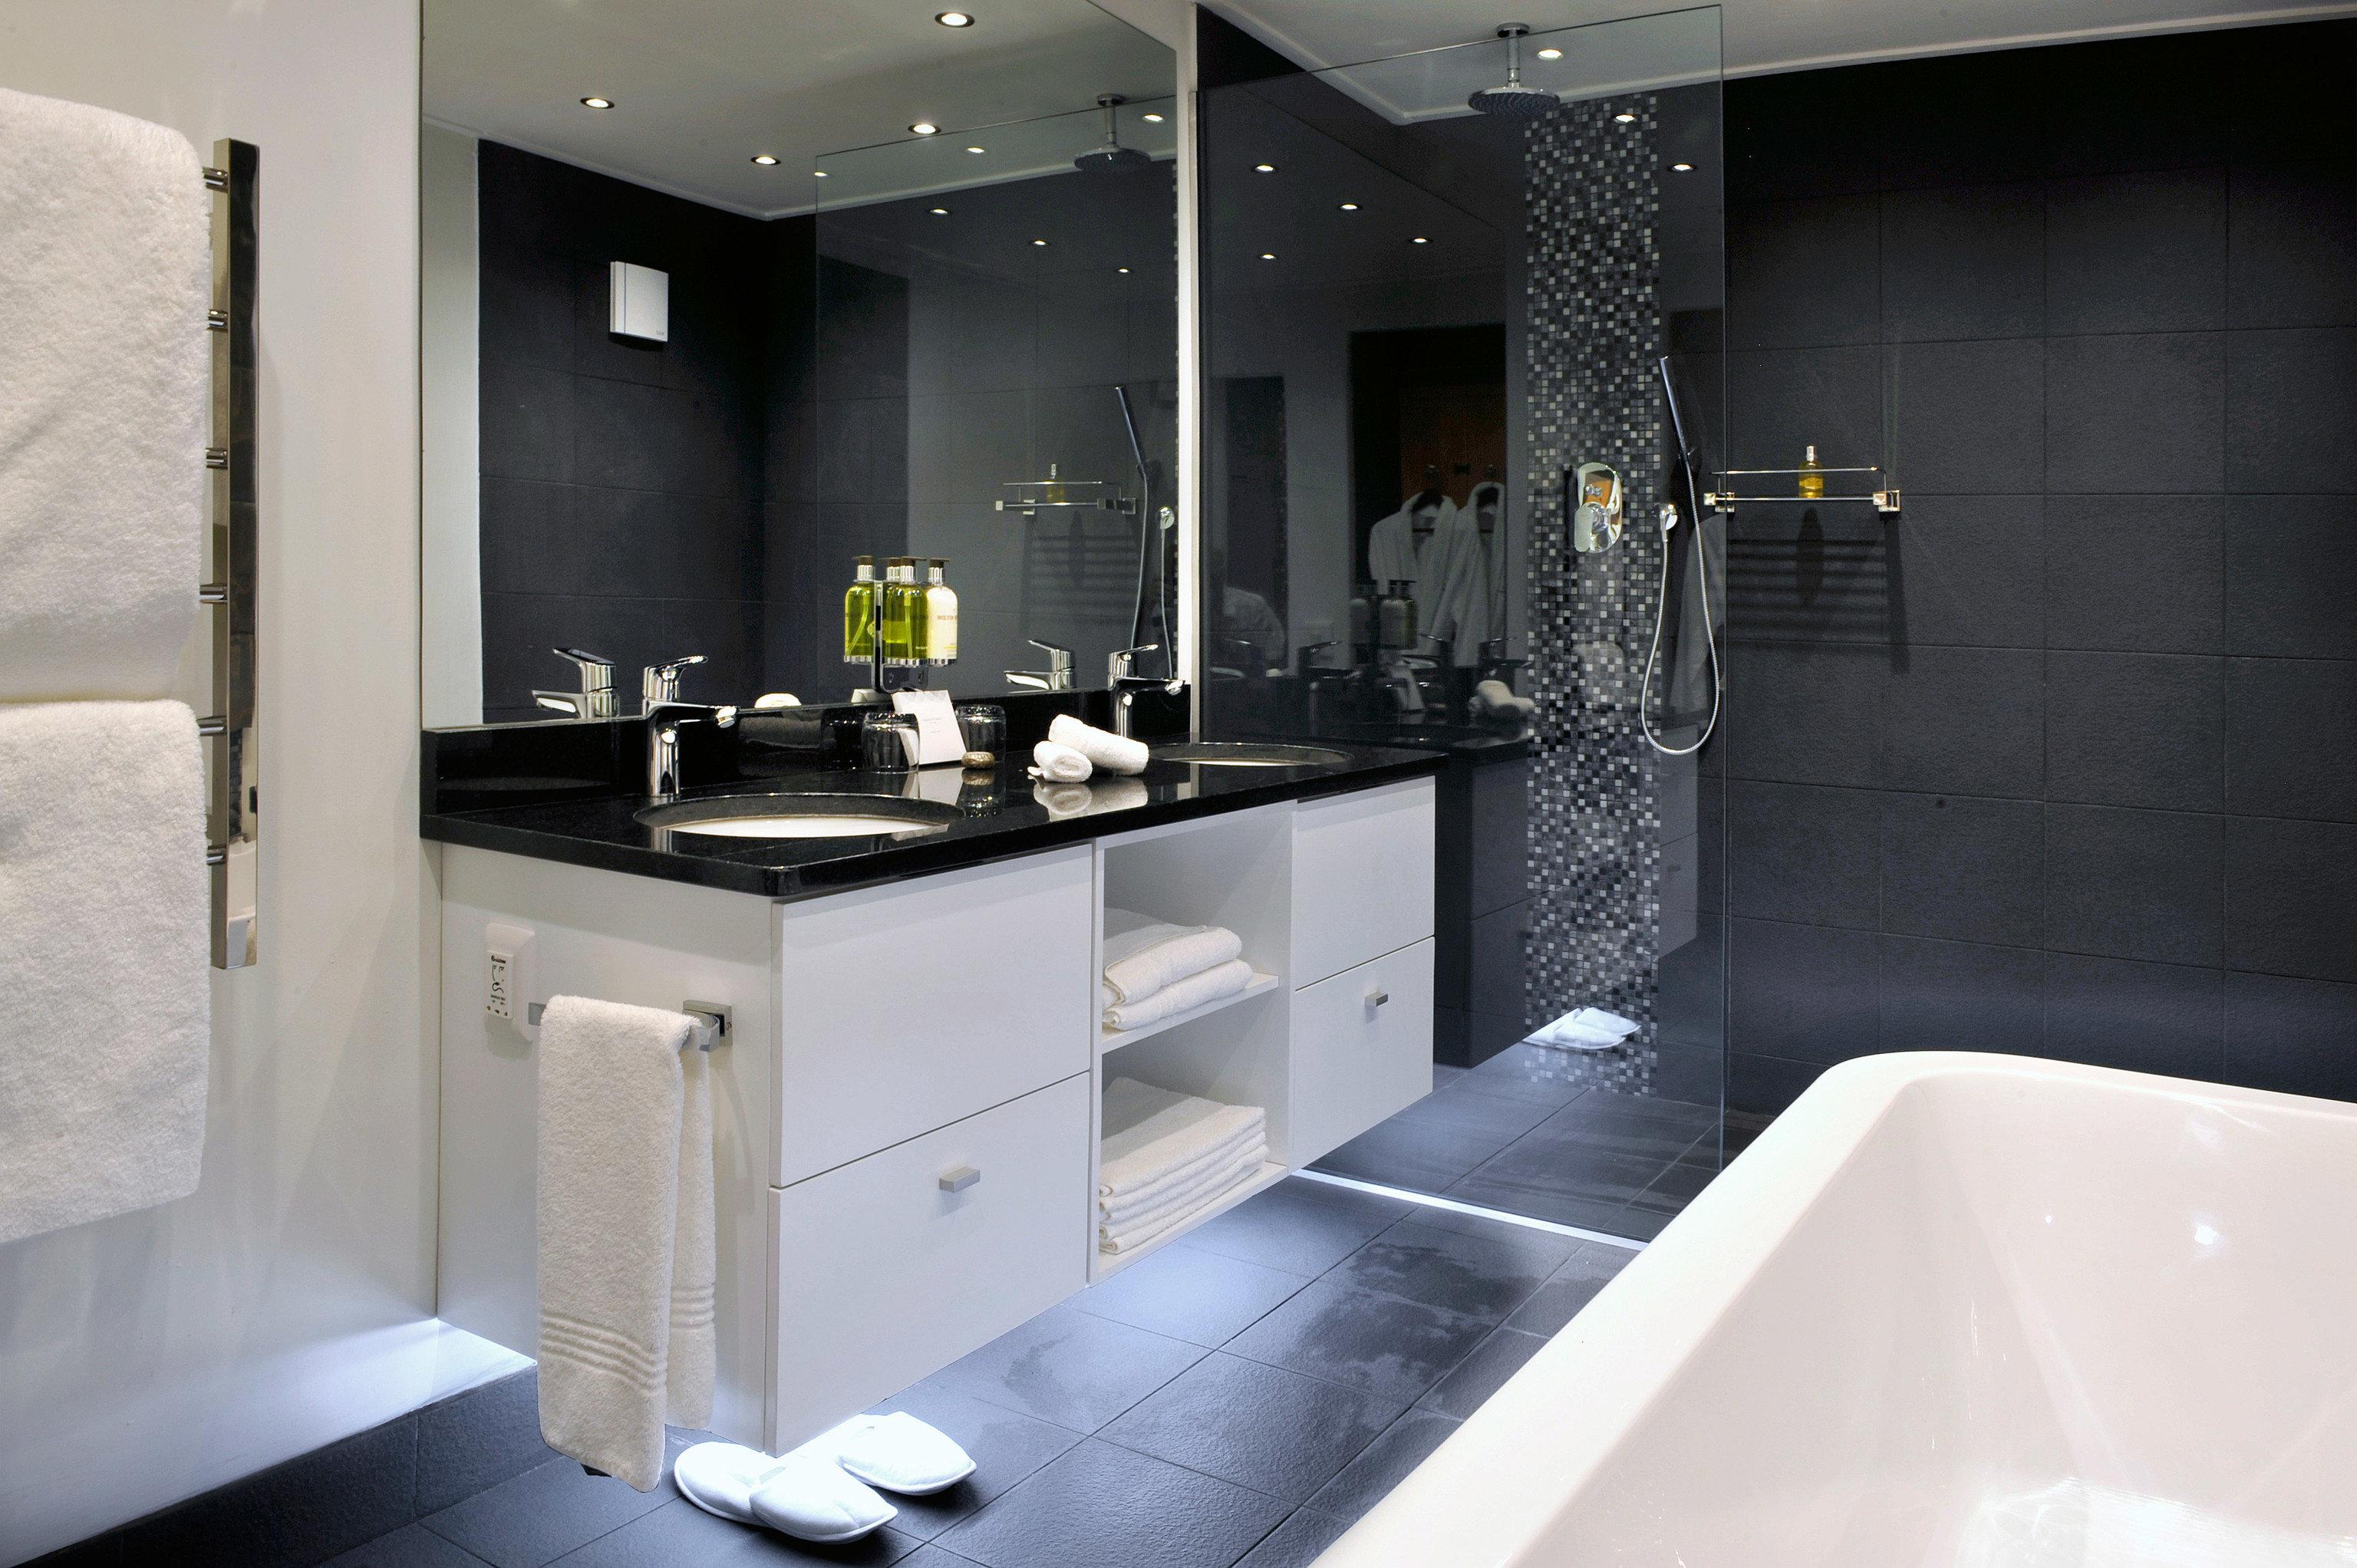 bathroom property sink toilet home plumbing fixture white counter Suite bathtub bidet flooring Modern Bath